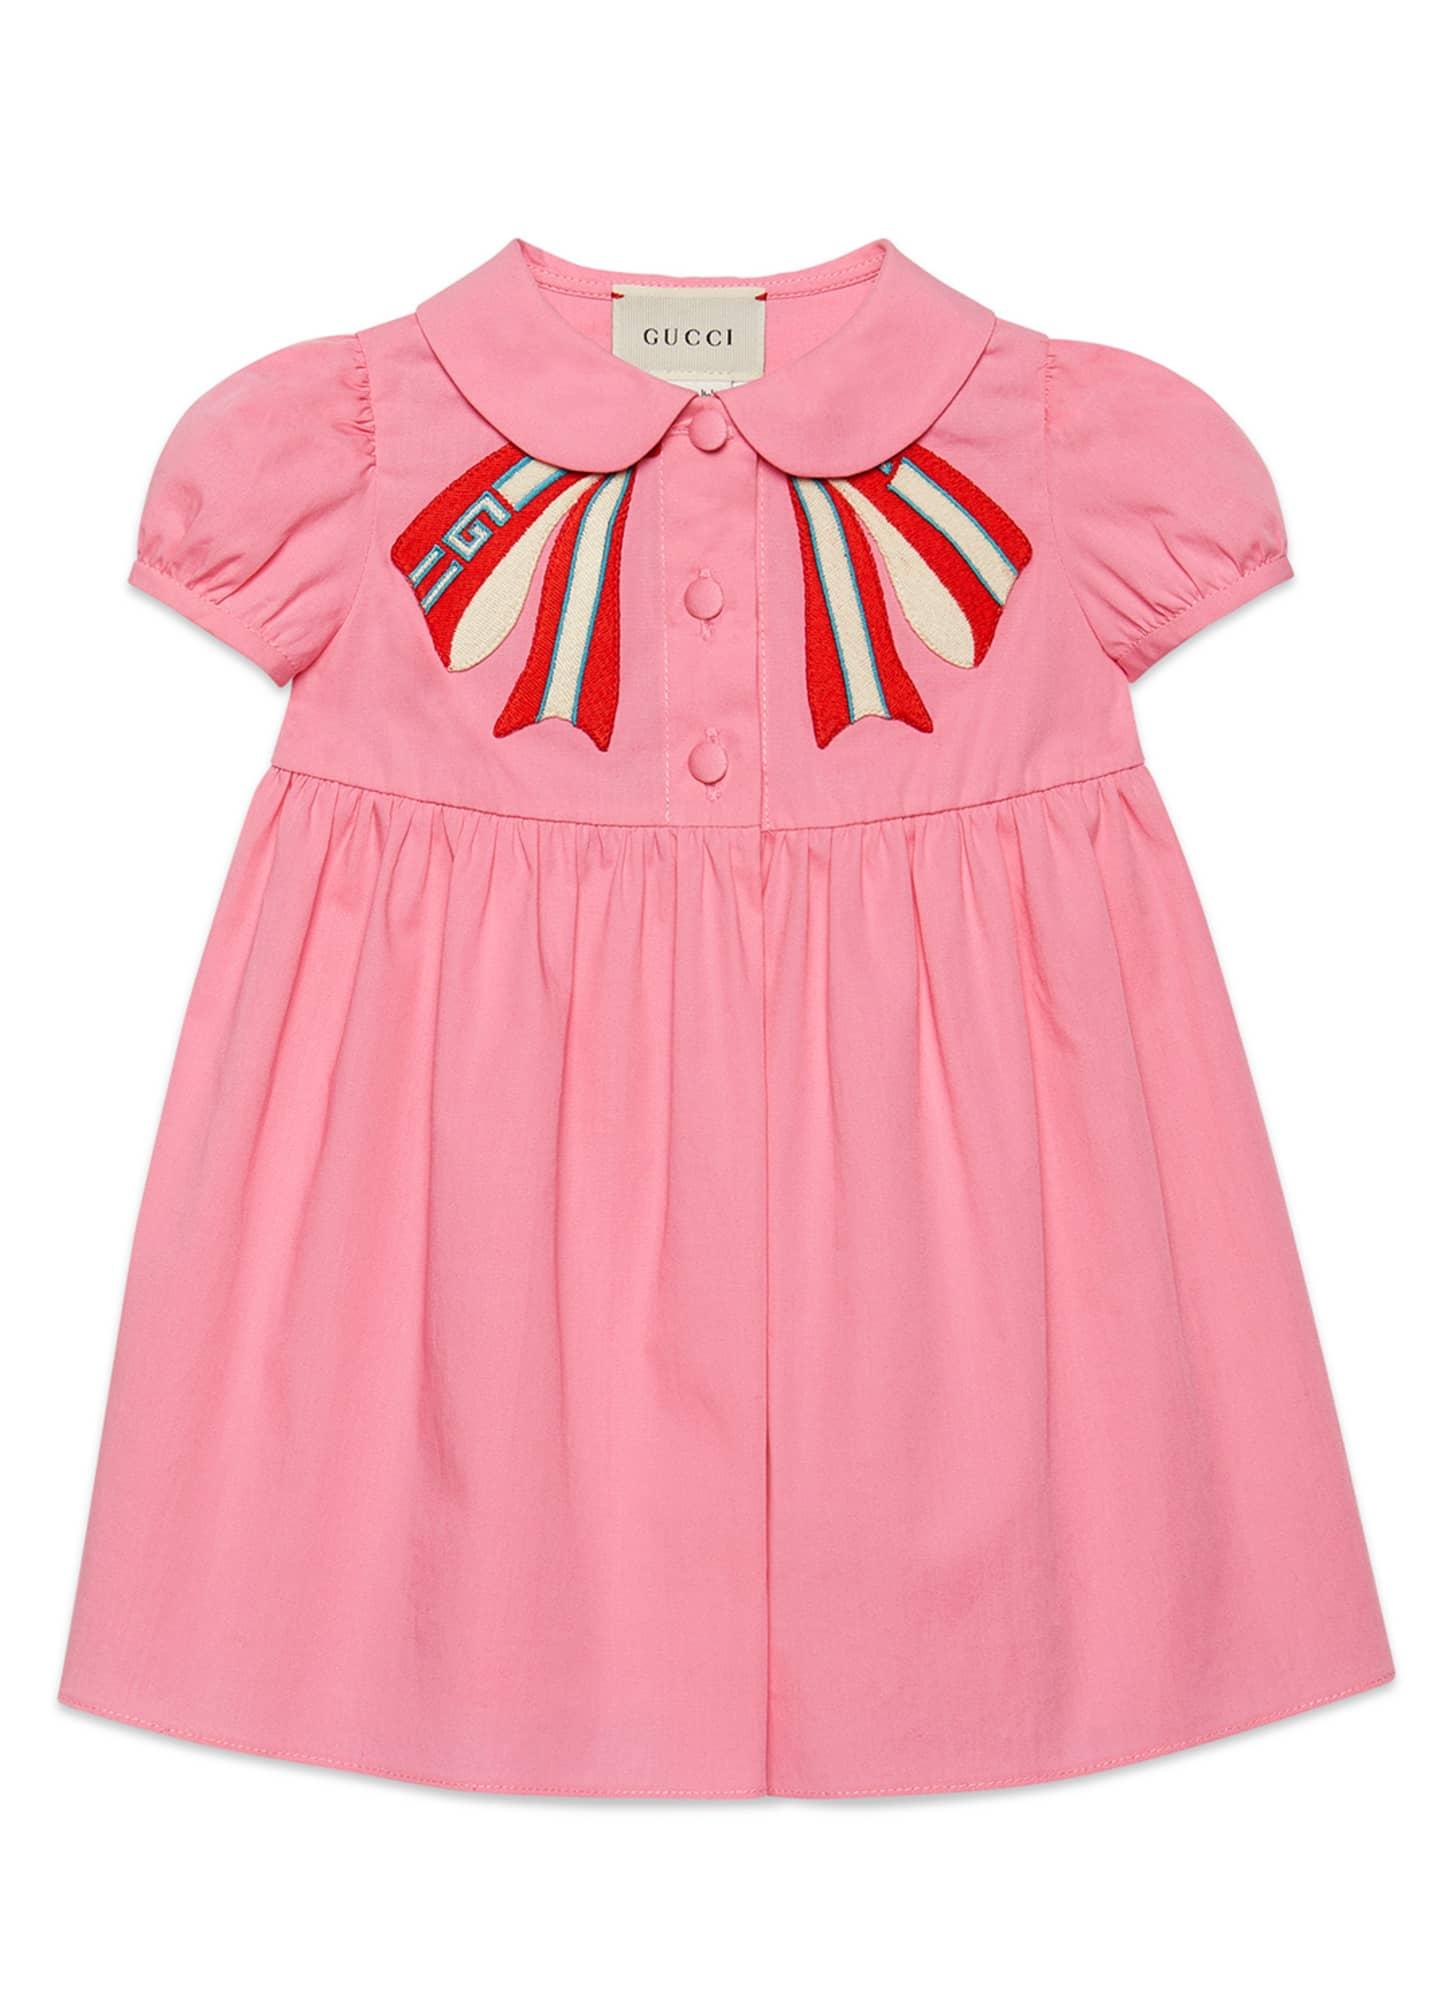 Gucci Peter Pan-Collar Dress w/ Logo Bow Applique,